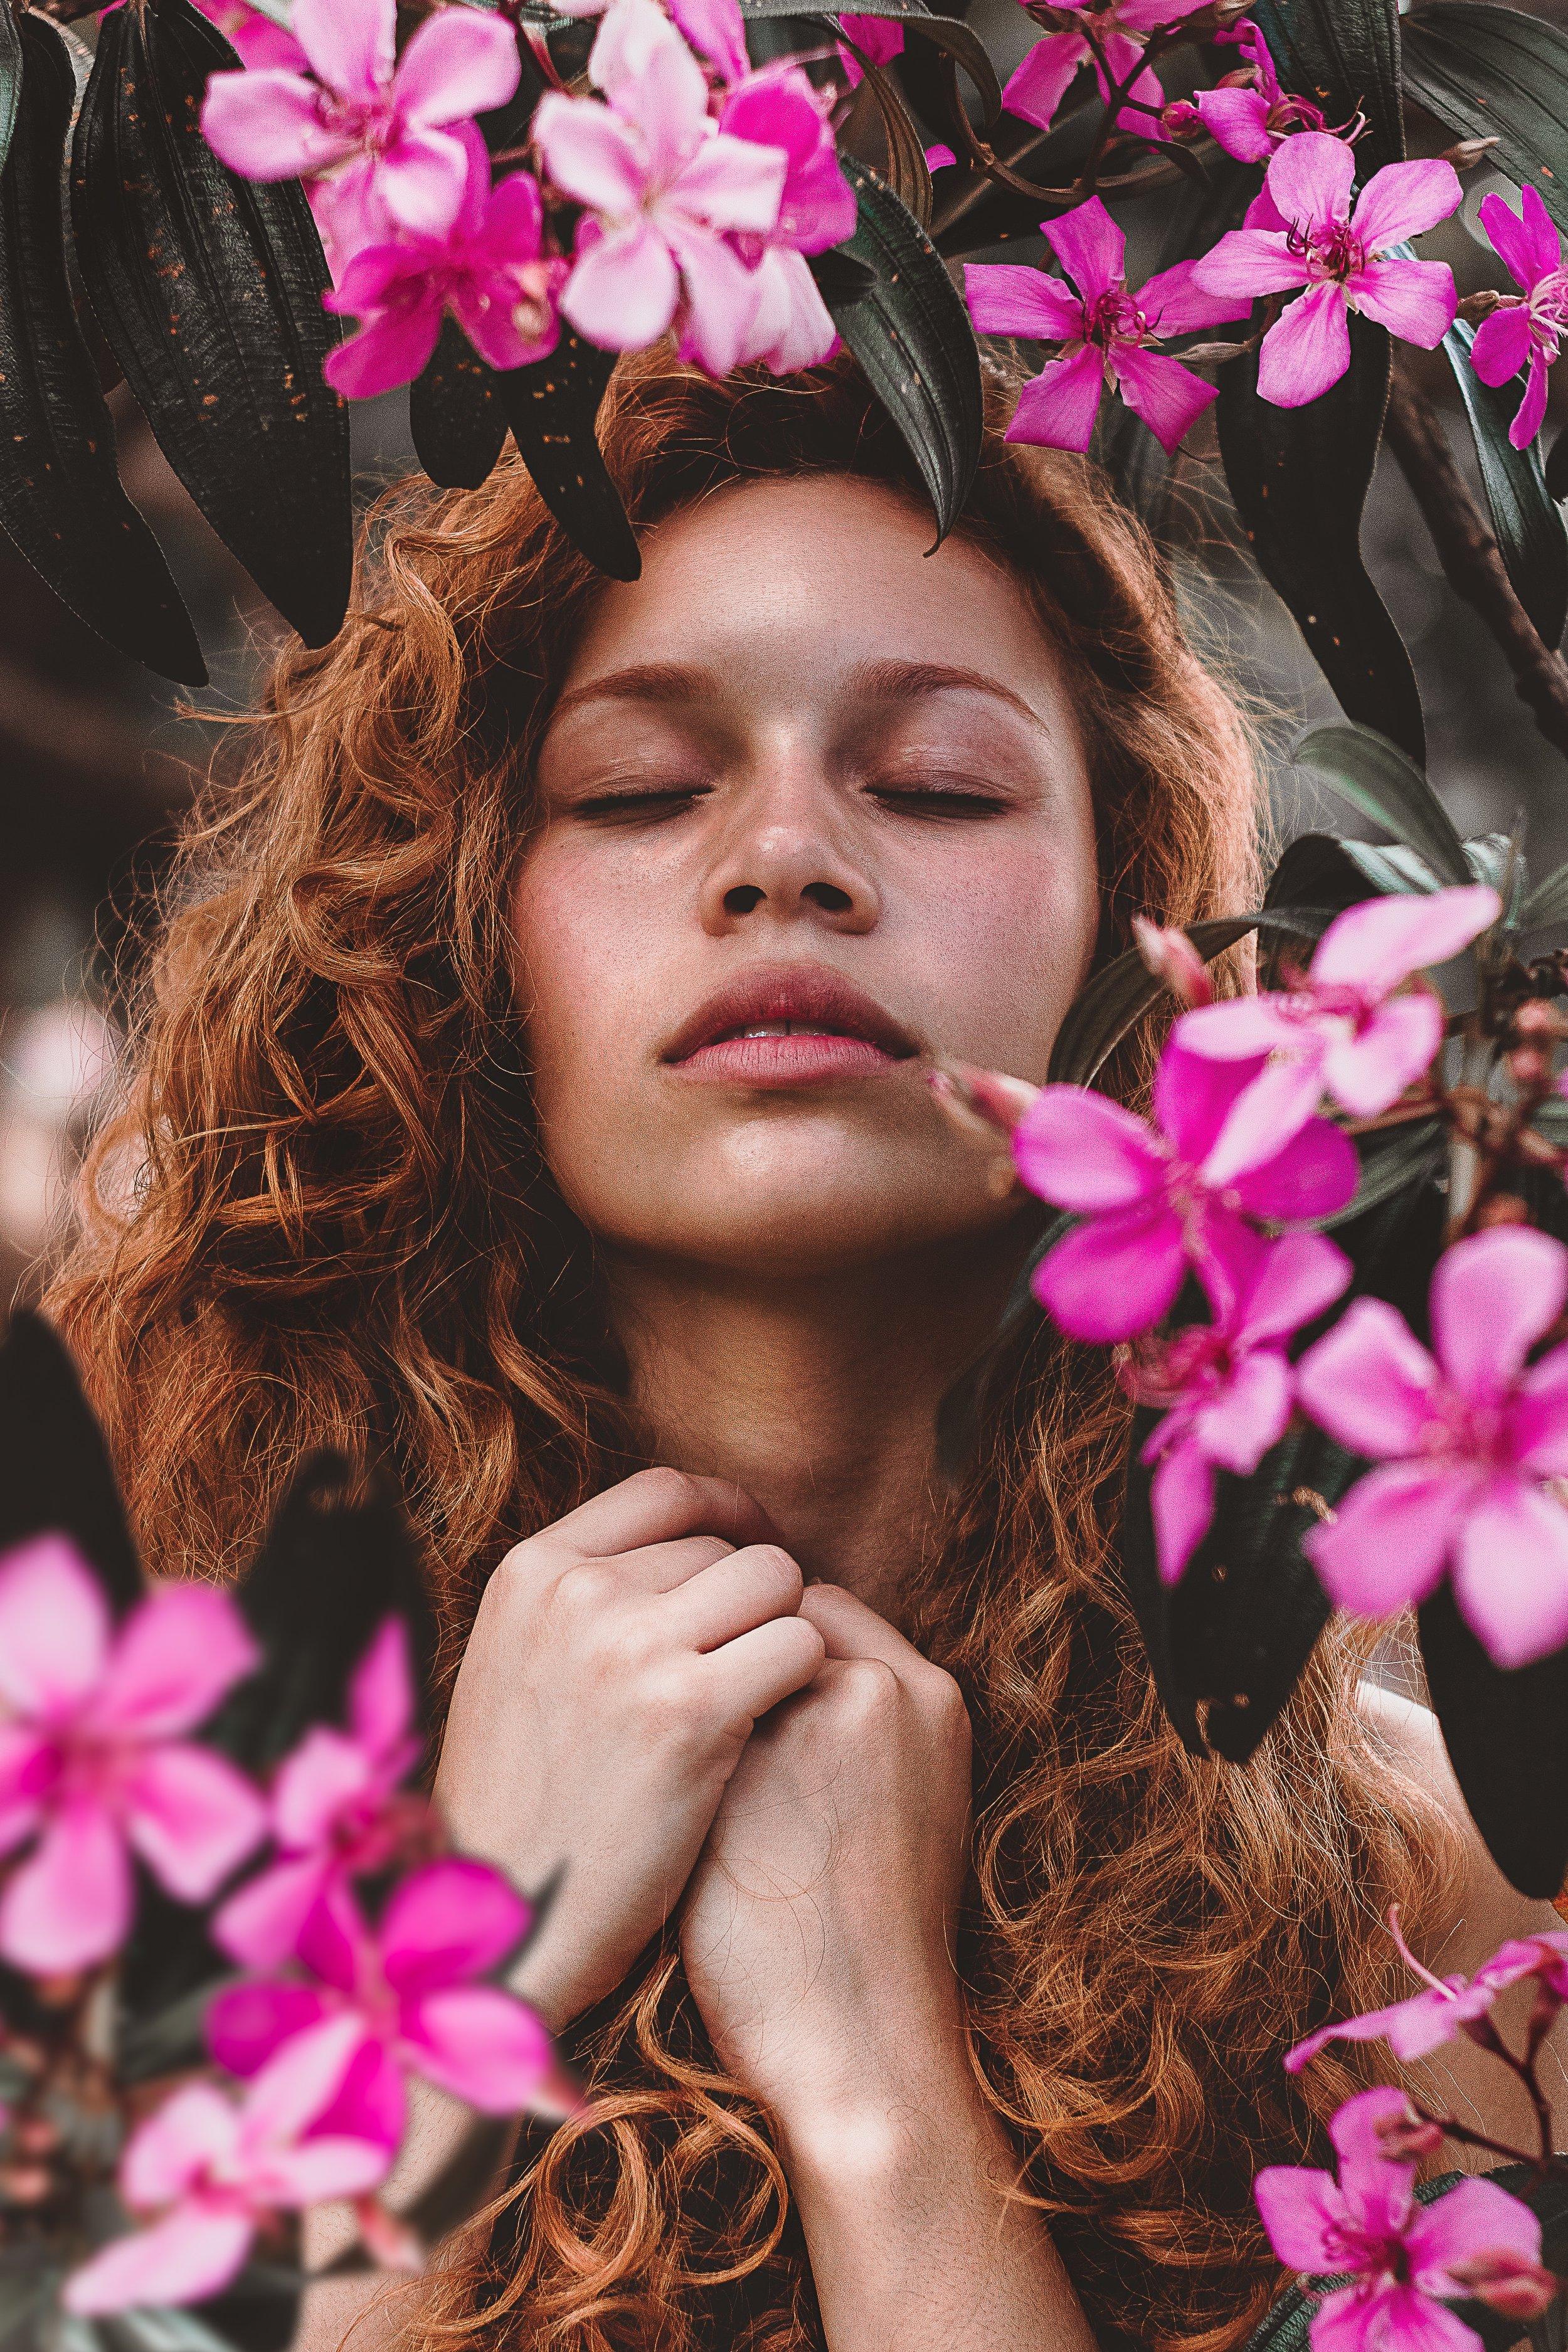 beautiful-flowers-beautiful-woman-bloom-1964442.jpg